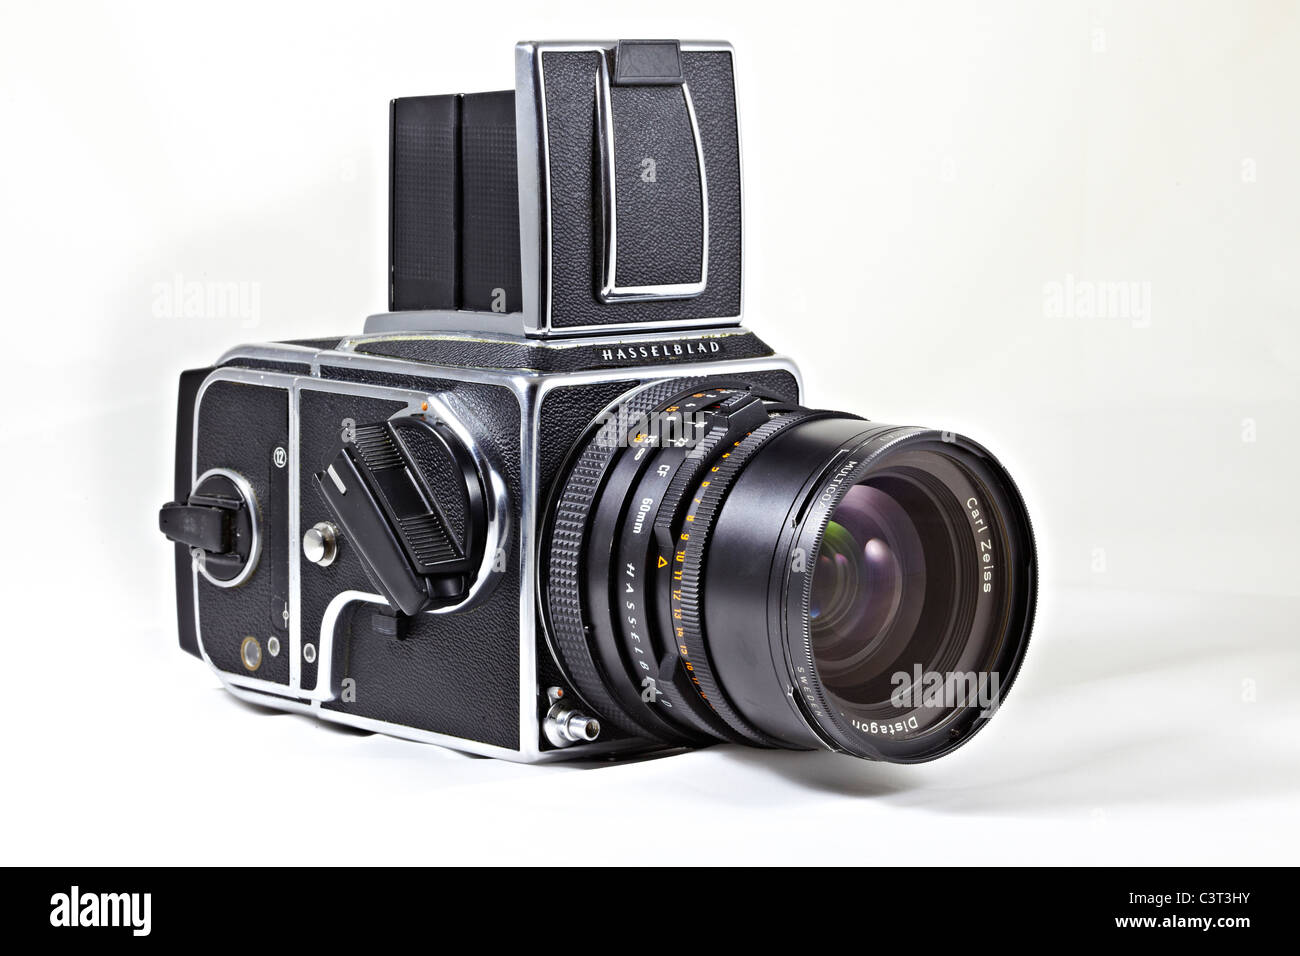 Legendary Hasselblad 500 CM medium format 120 roll film camera and lens. - Stock Image